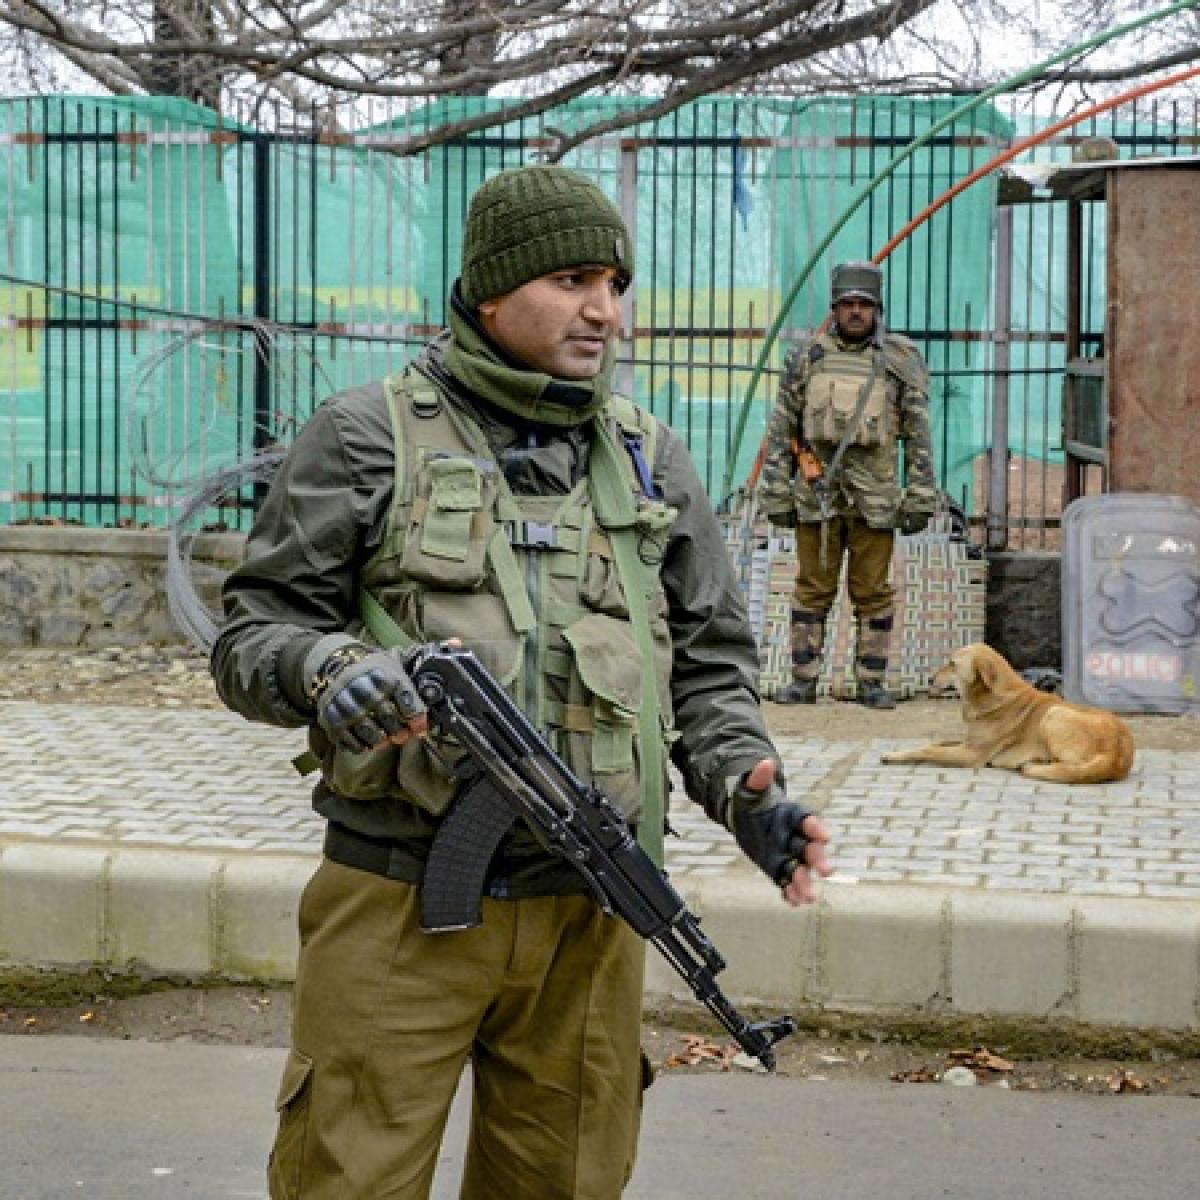 1 terrorist killed, 2 security personnel injured in an encounter in Srinagar's Nawakadal area